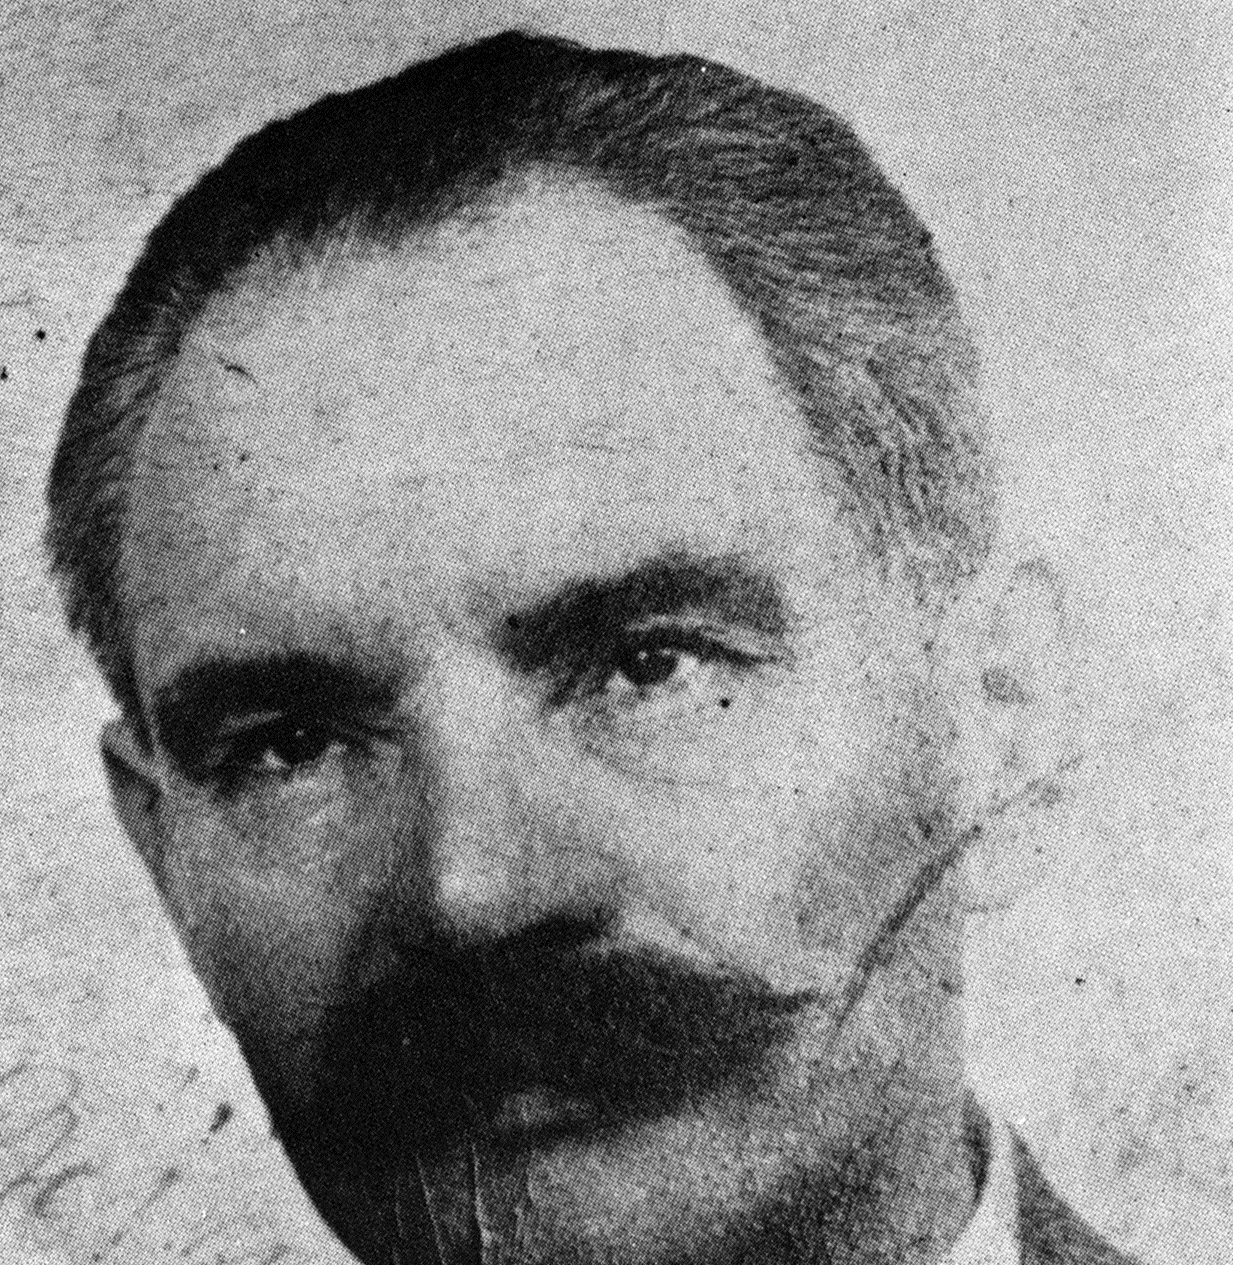 Aron Grünhut pod falošnou identitou v Budapešti. Zdroj - Archív Martina Mózera